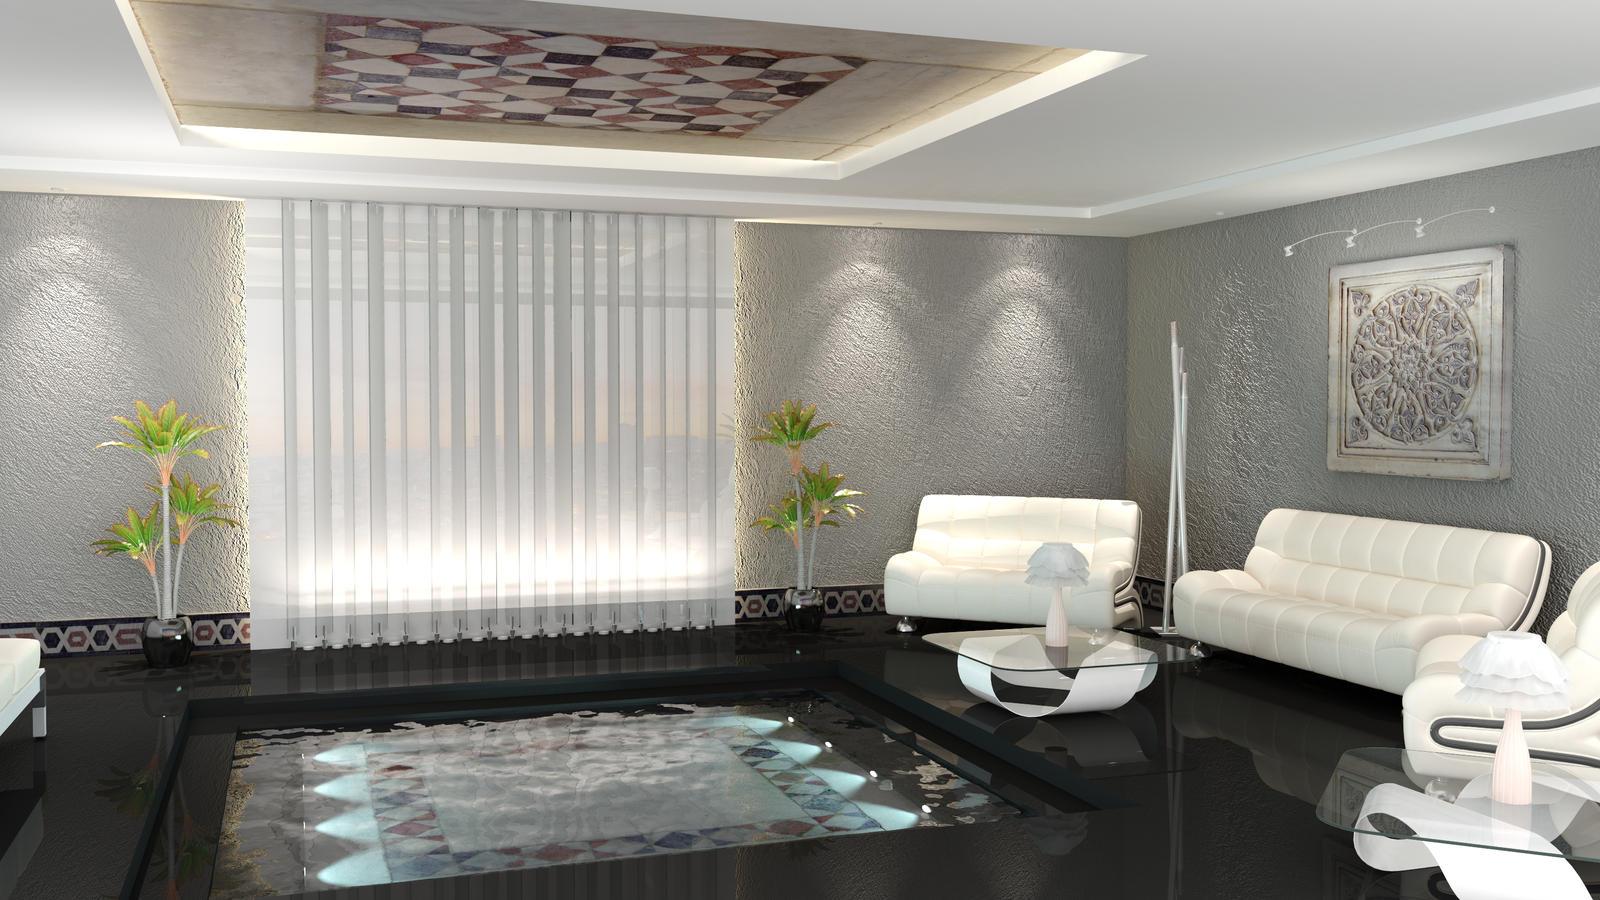 Living Room Lounge Interiors pool lounge interior by shyntakun on deviantart shyntakun